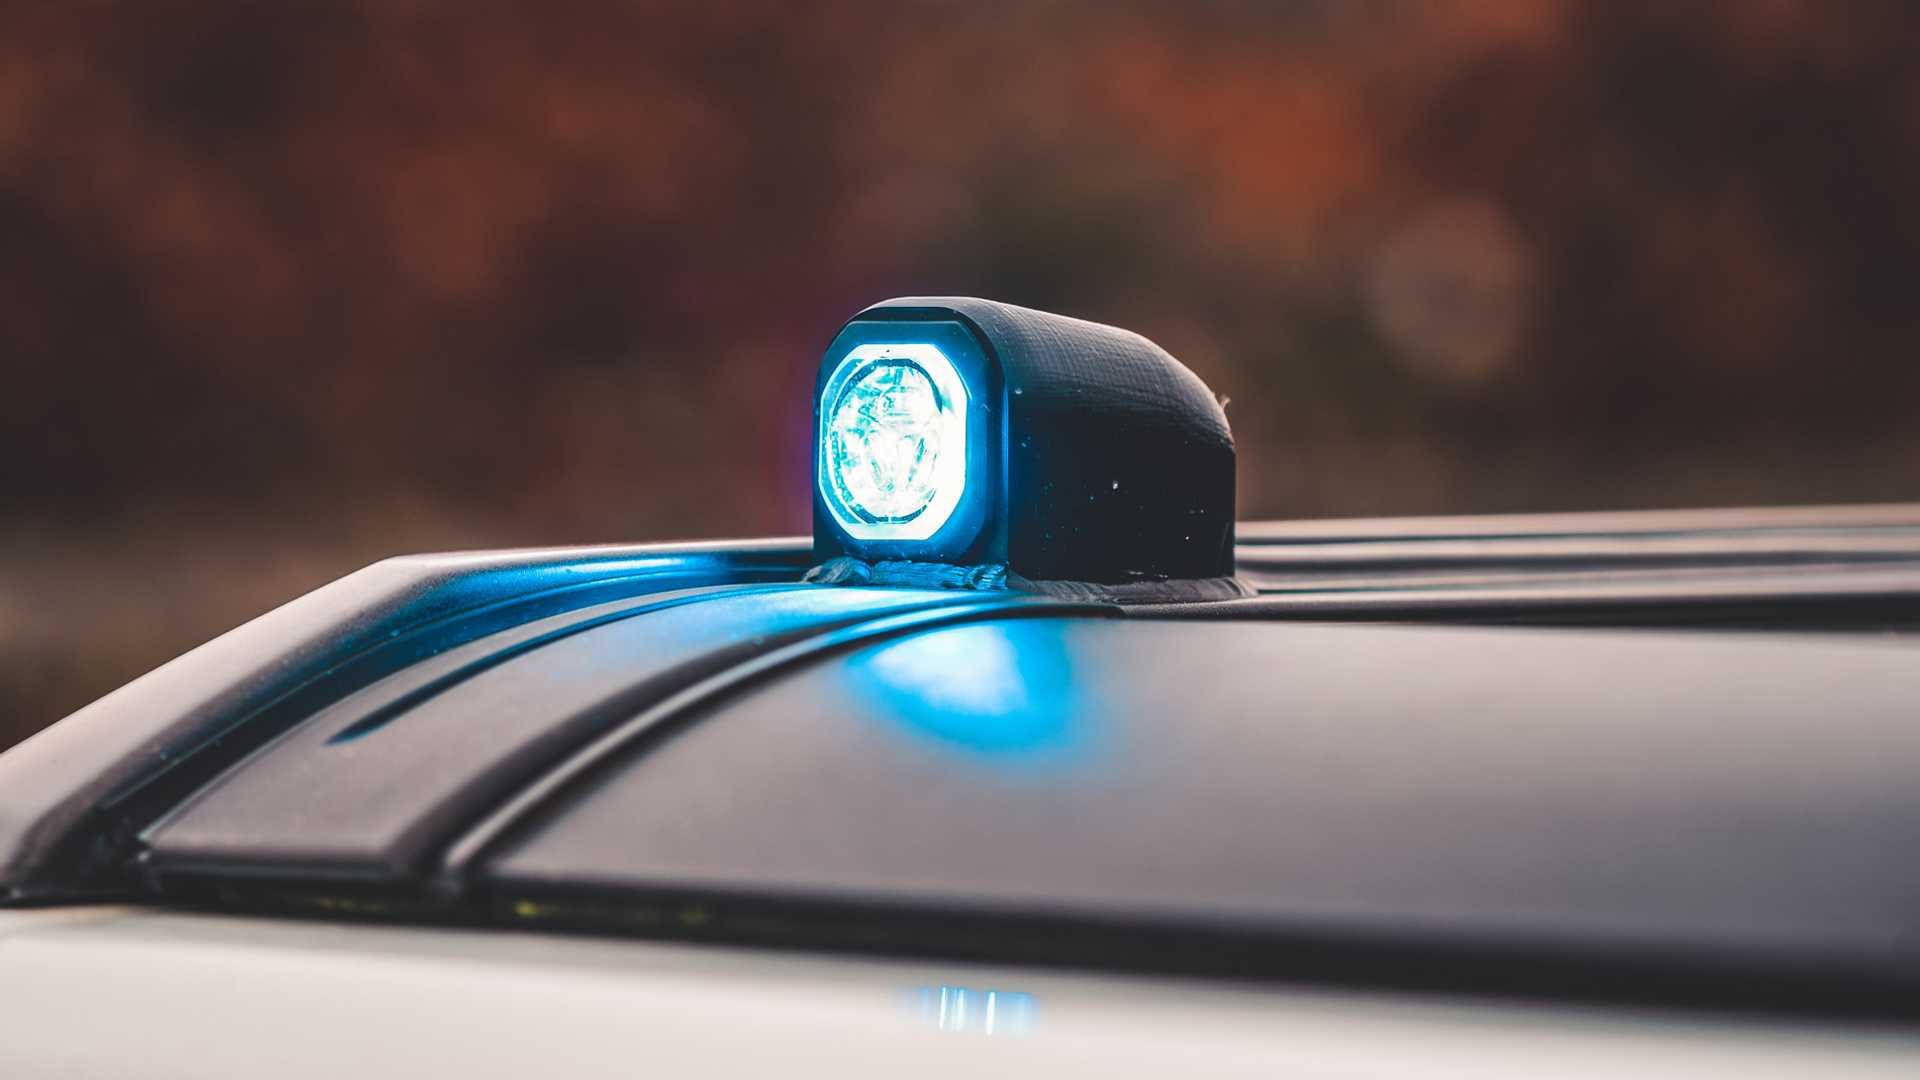 Ford-Focus-ST-and-Ranger-Raptor-UK-police-cars-20